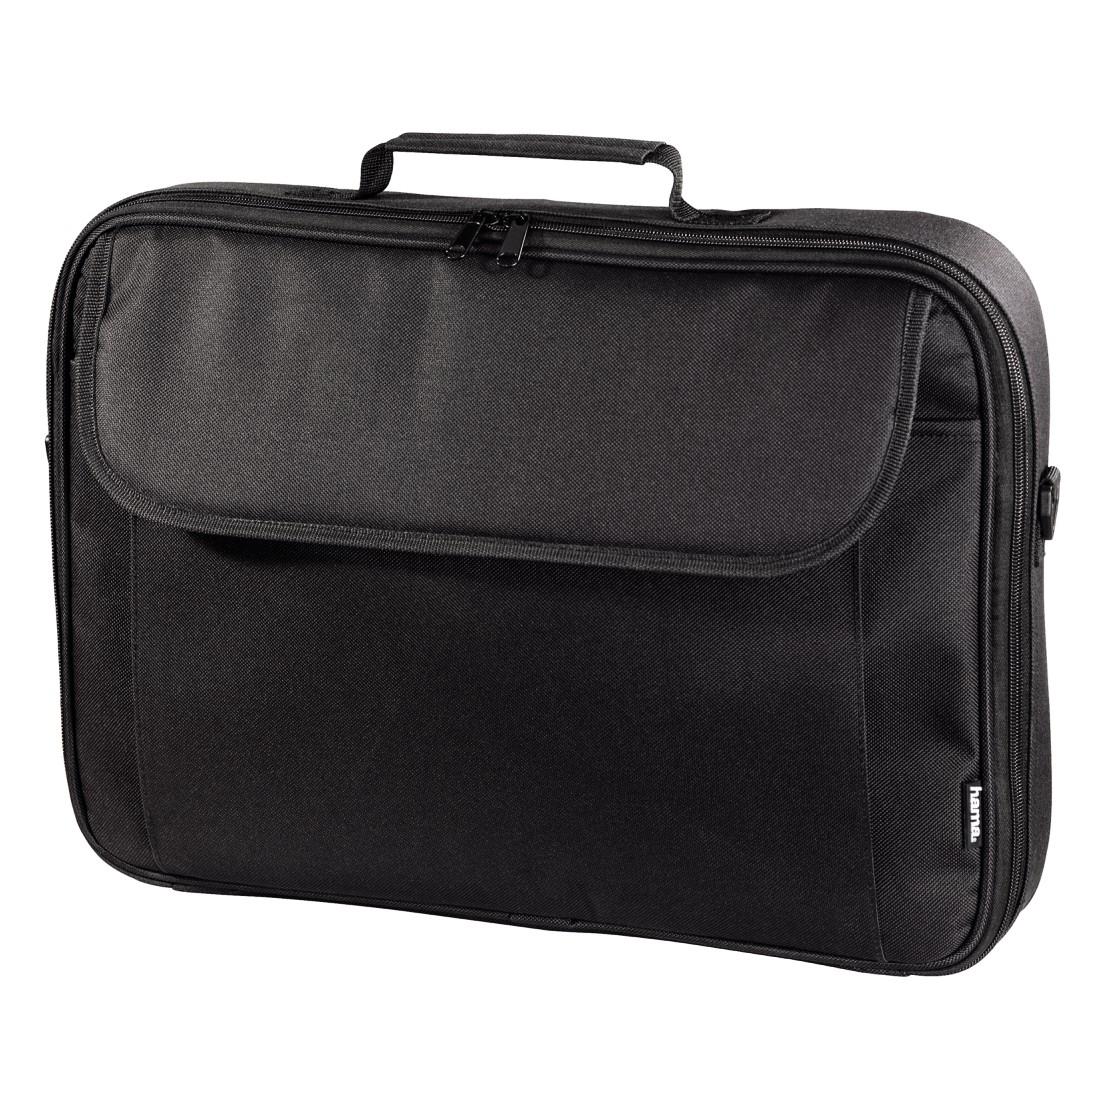 Сумка для ноутбука 17.3 Hama Sportsline Montego, Black (00101087)101087